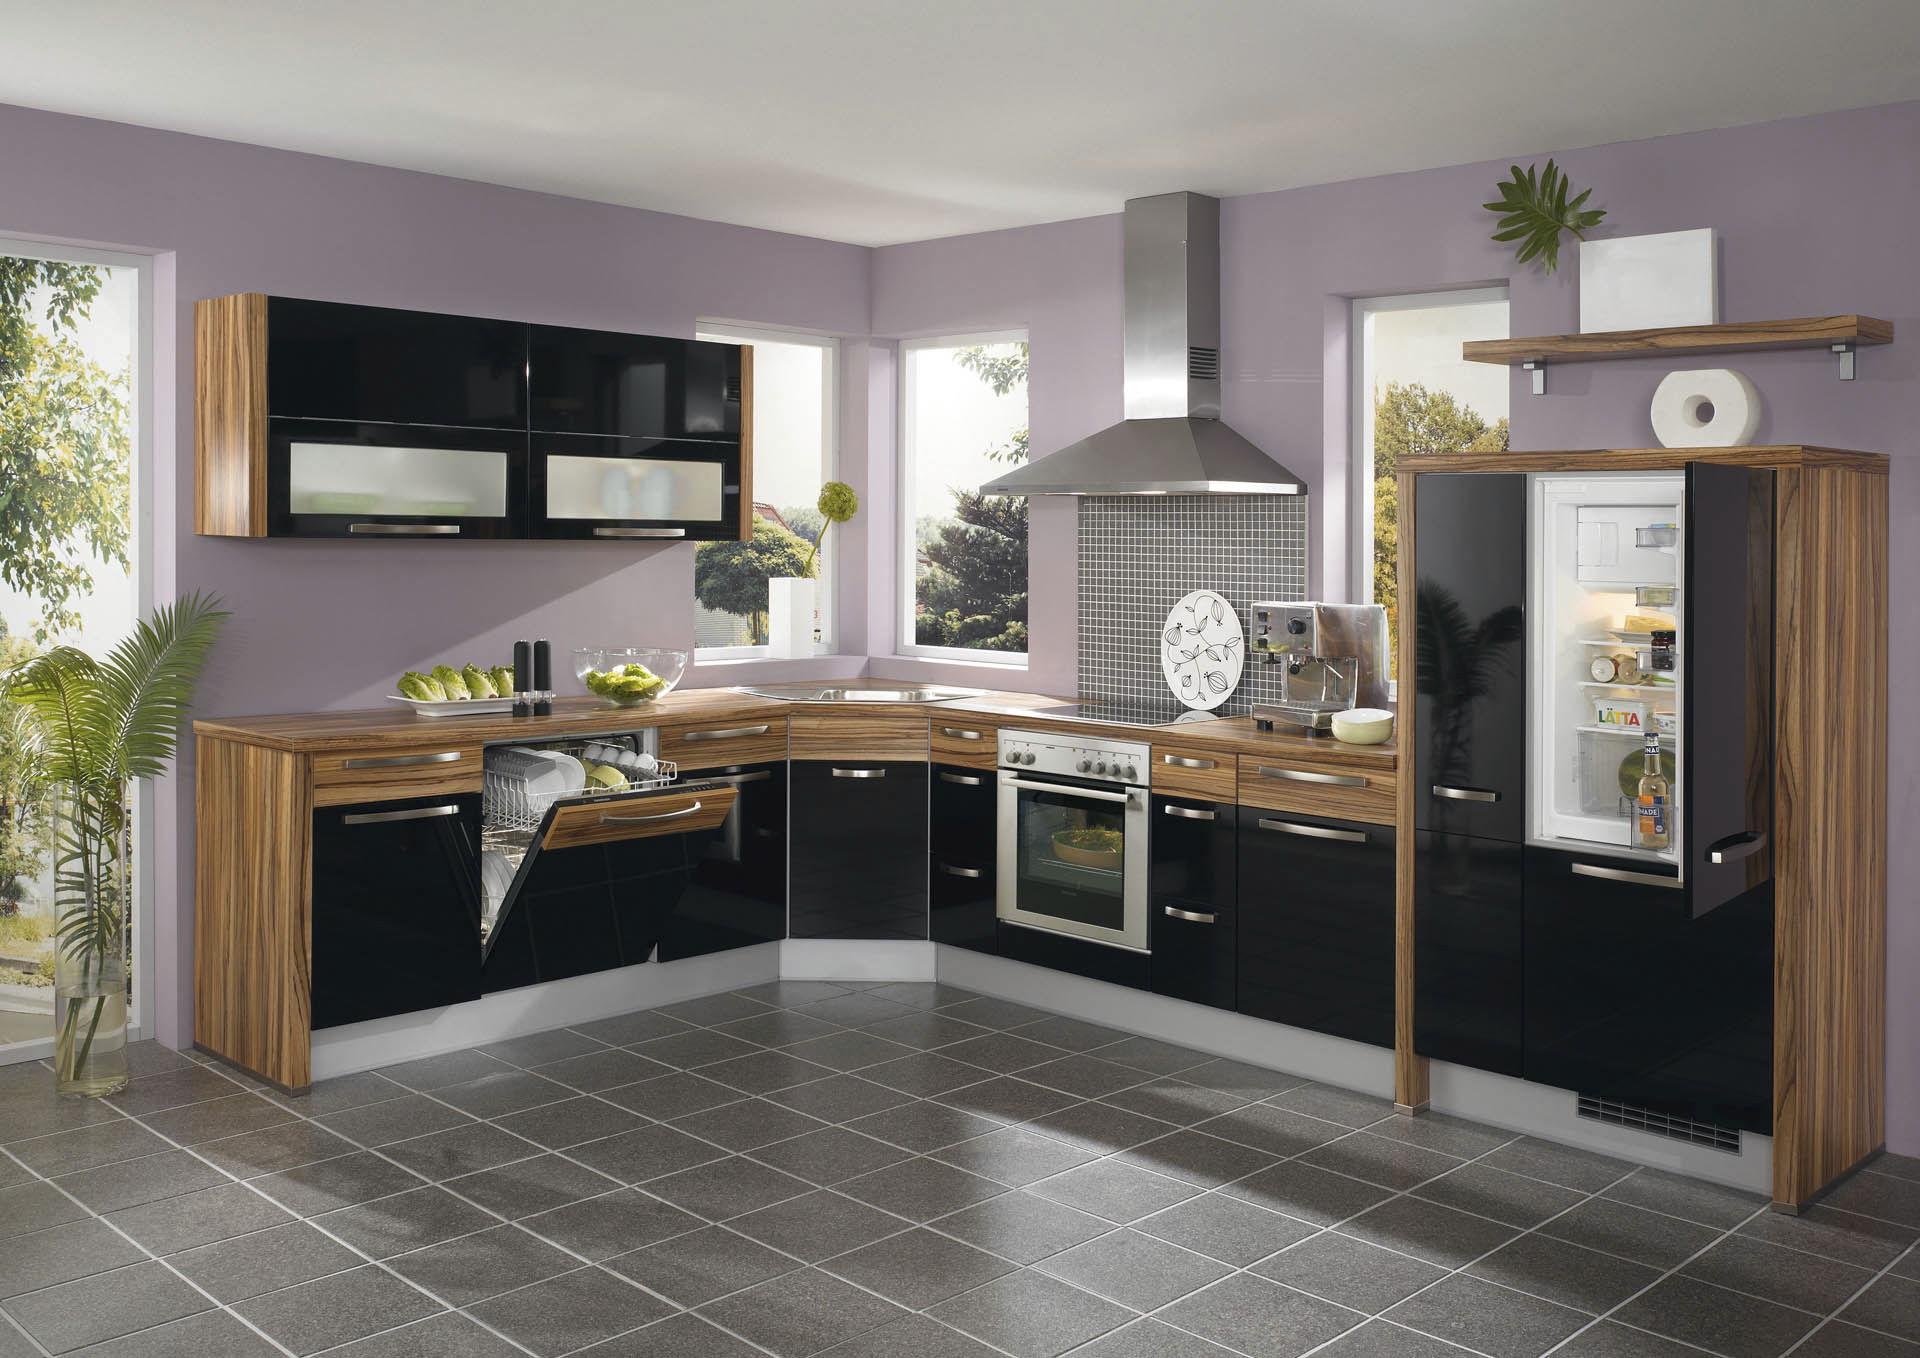 Moderne Küche / Holz / lackiert / Hochglanz - PRIMO 790 - nobilia